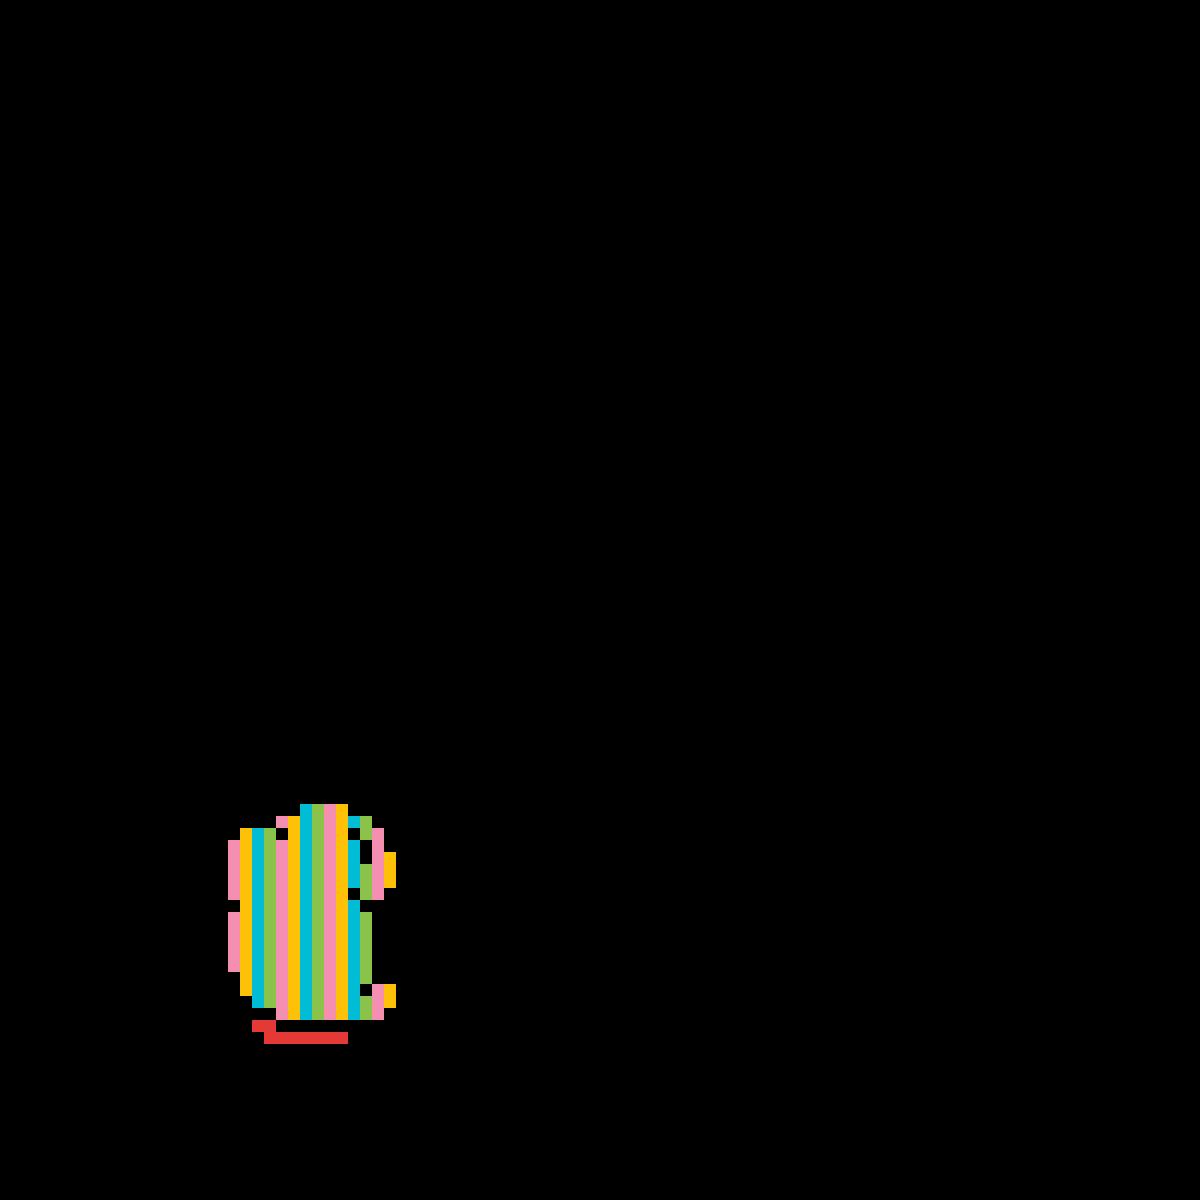 pixilart hypernova kirby 8 bit by joey gm 64